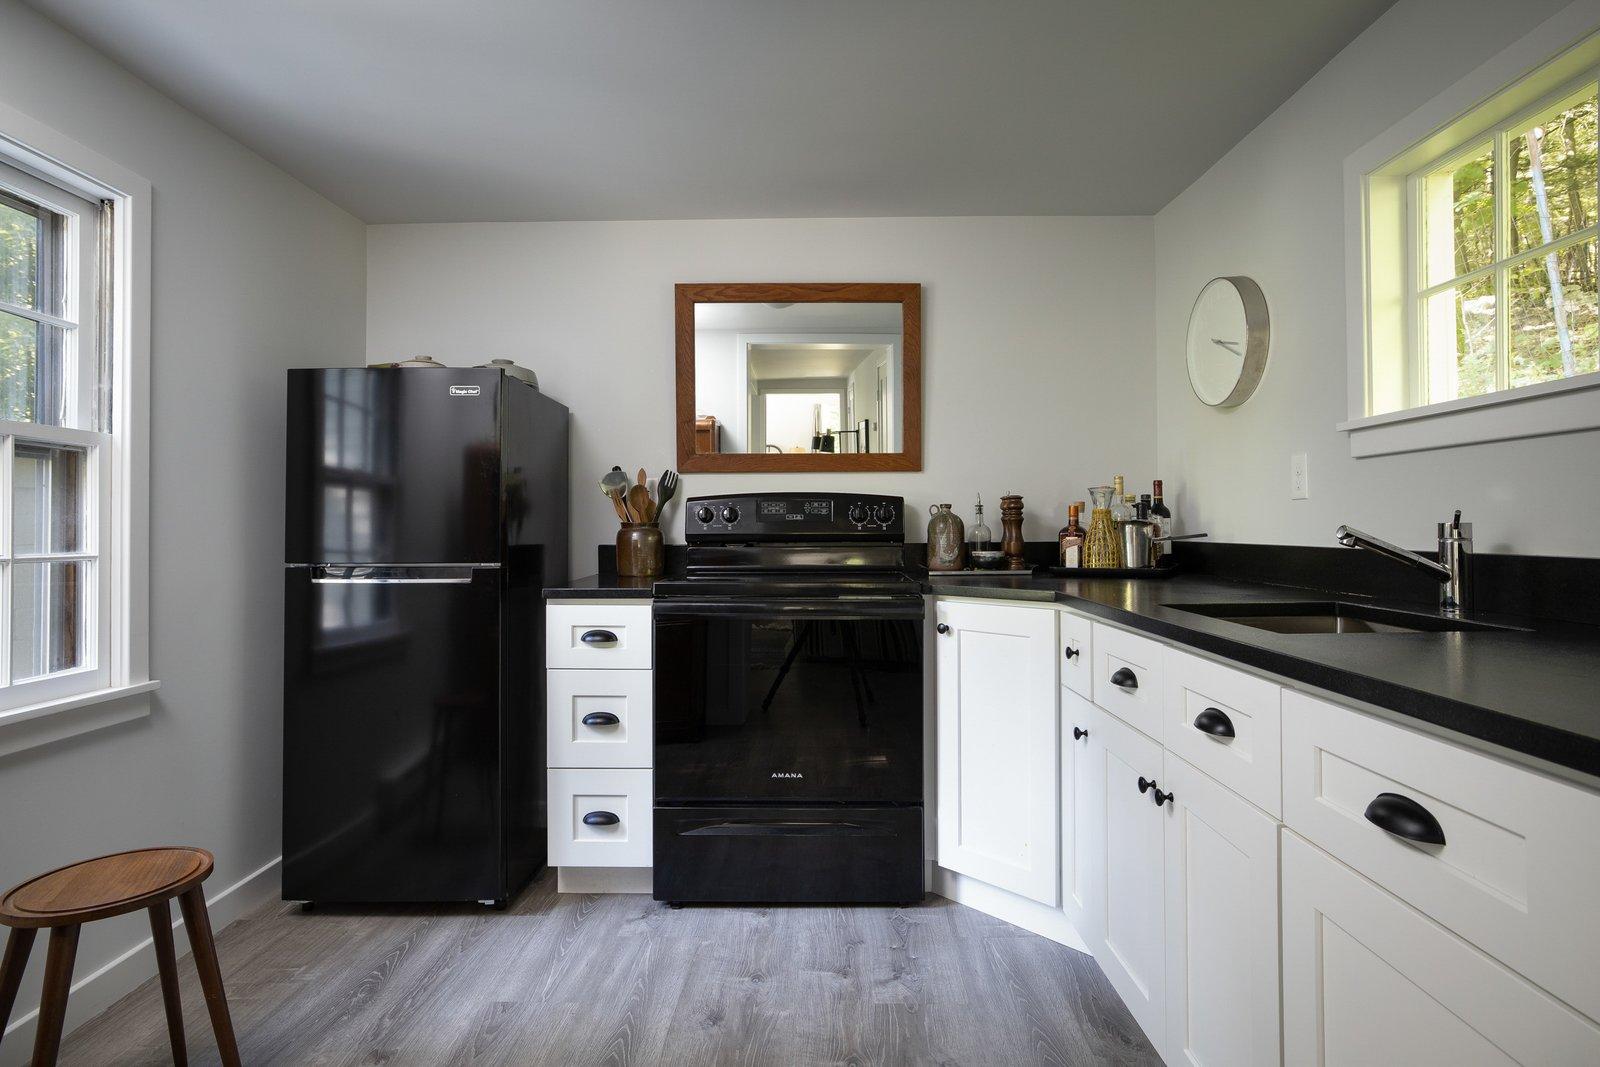 New England–style cottage kitchen